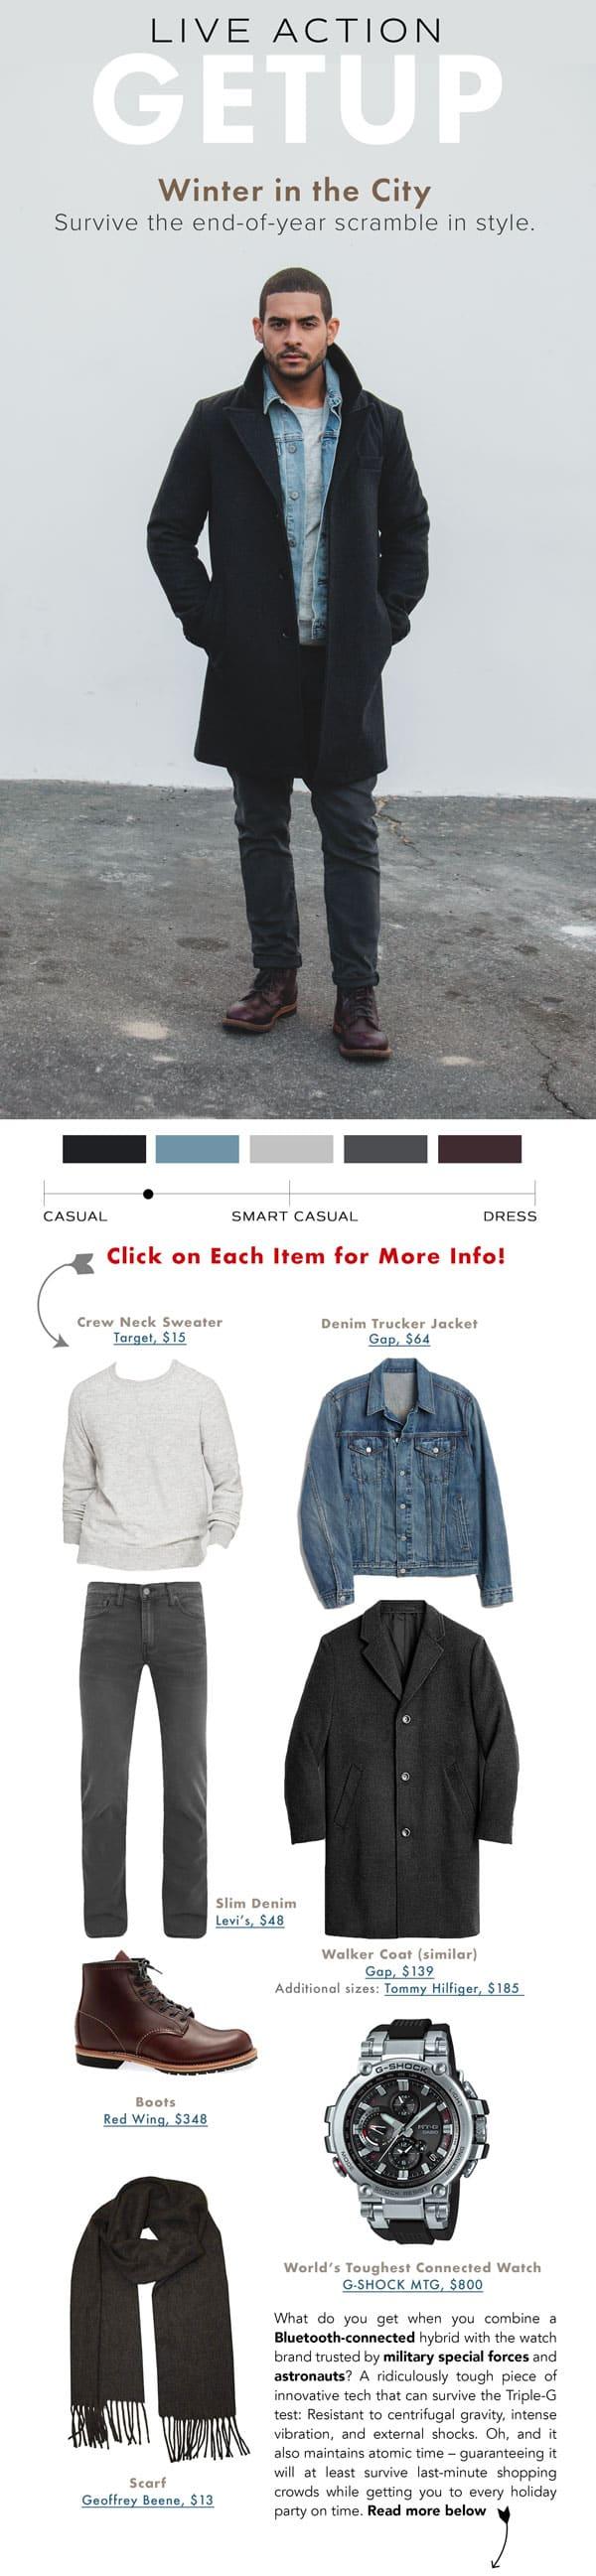 Primer Live Action Getup men casual outfit idea